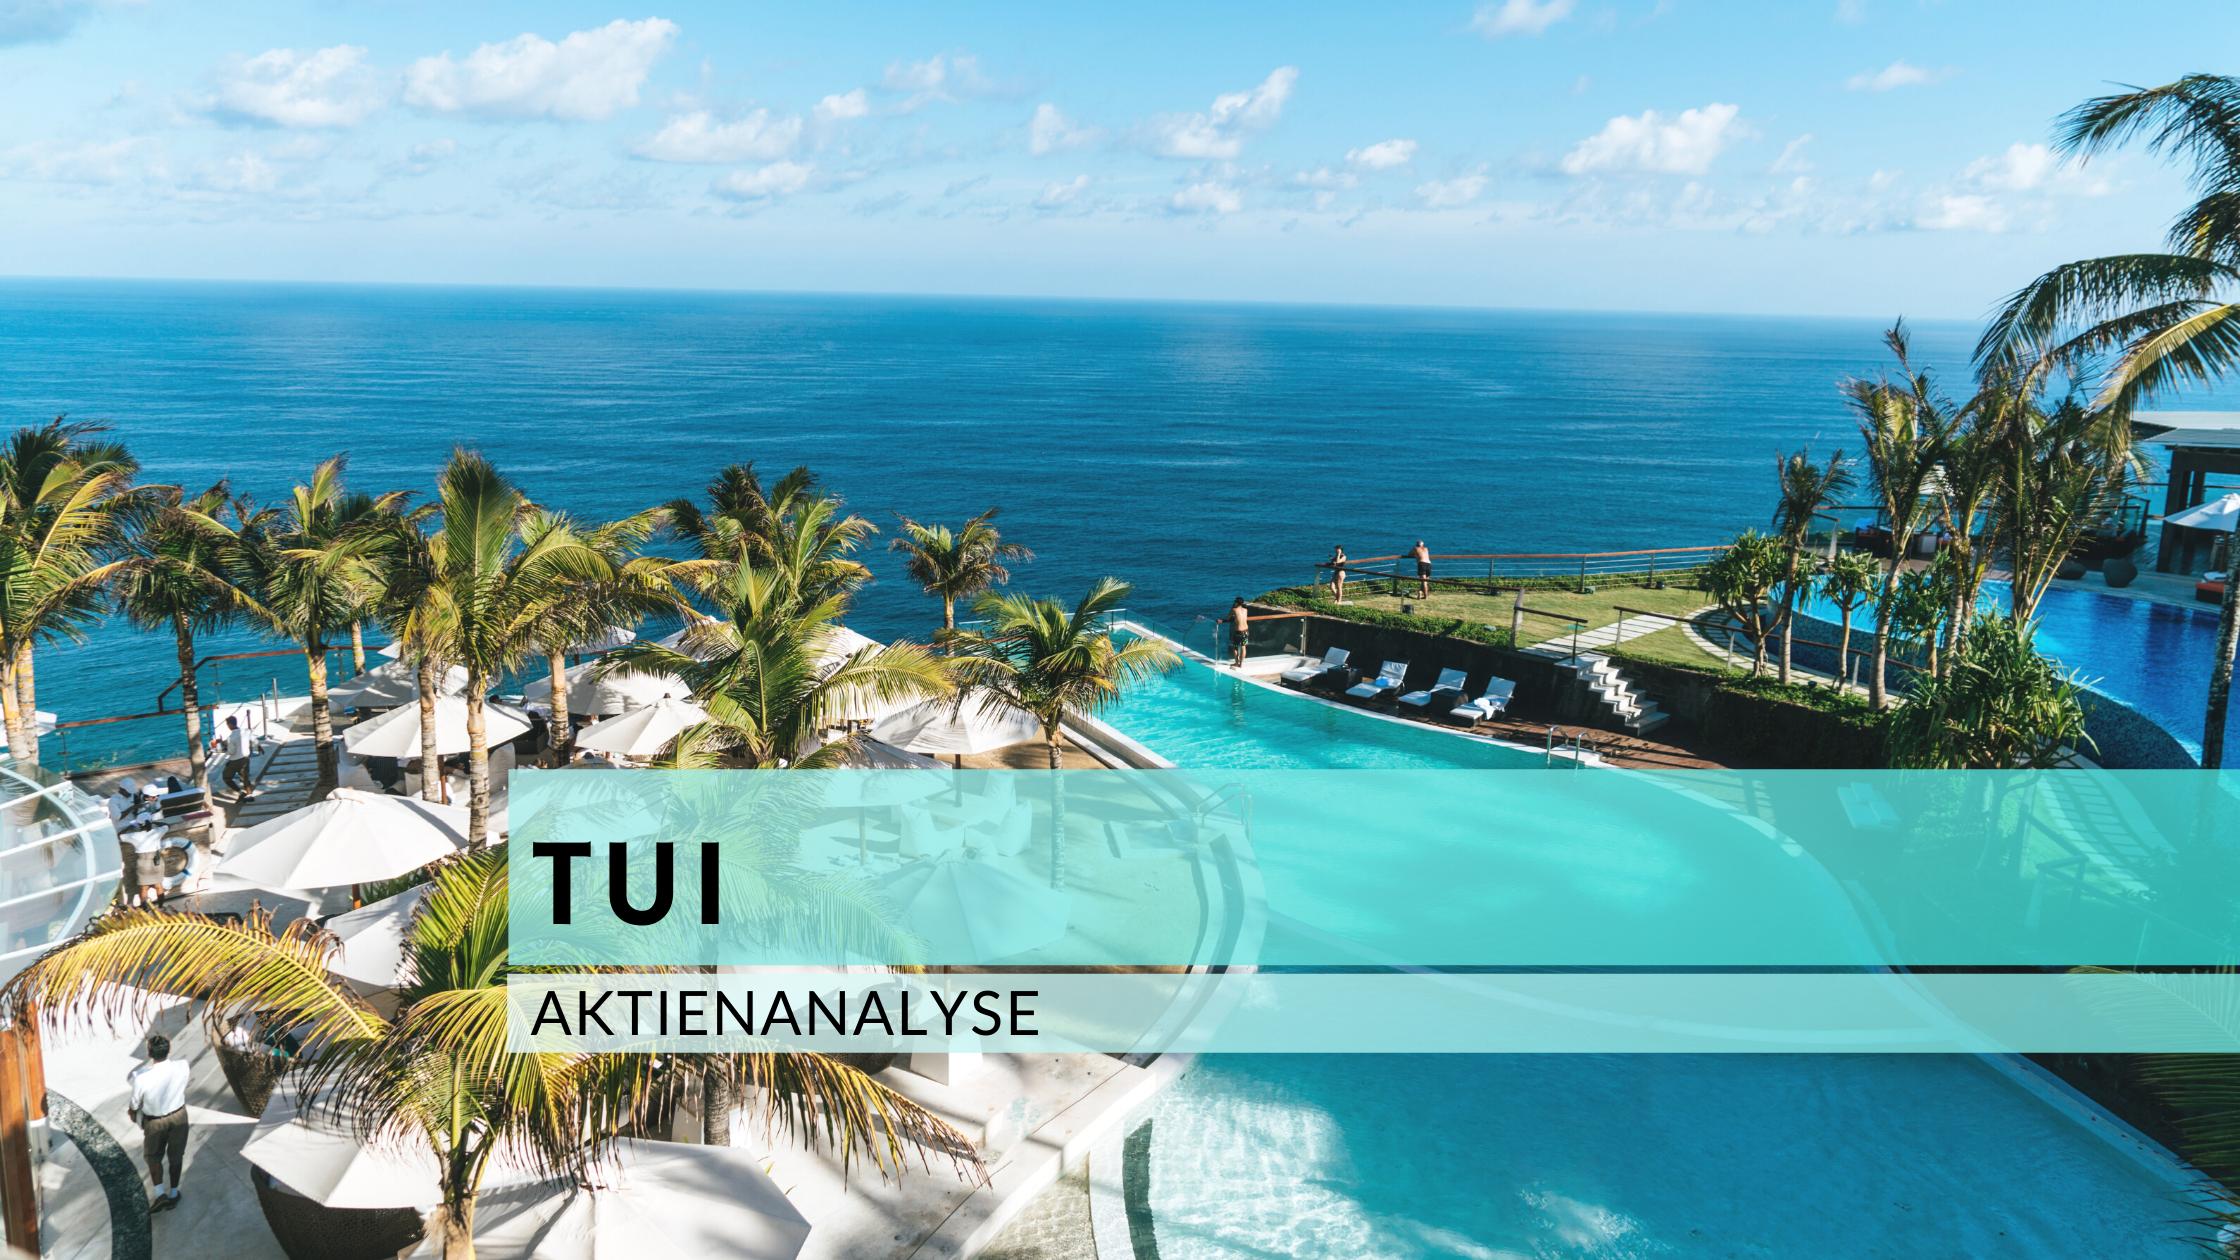 TUI Aktienanalyse Update